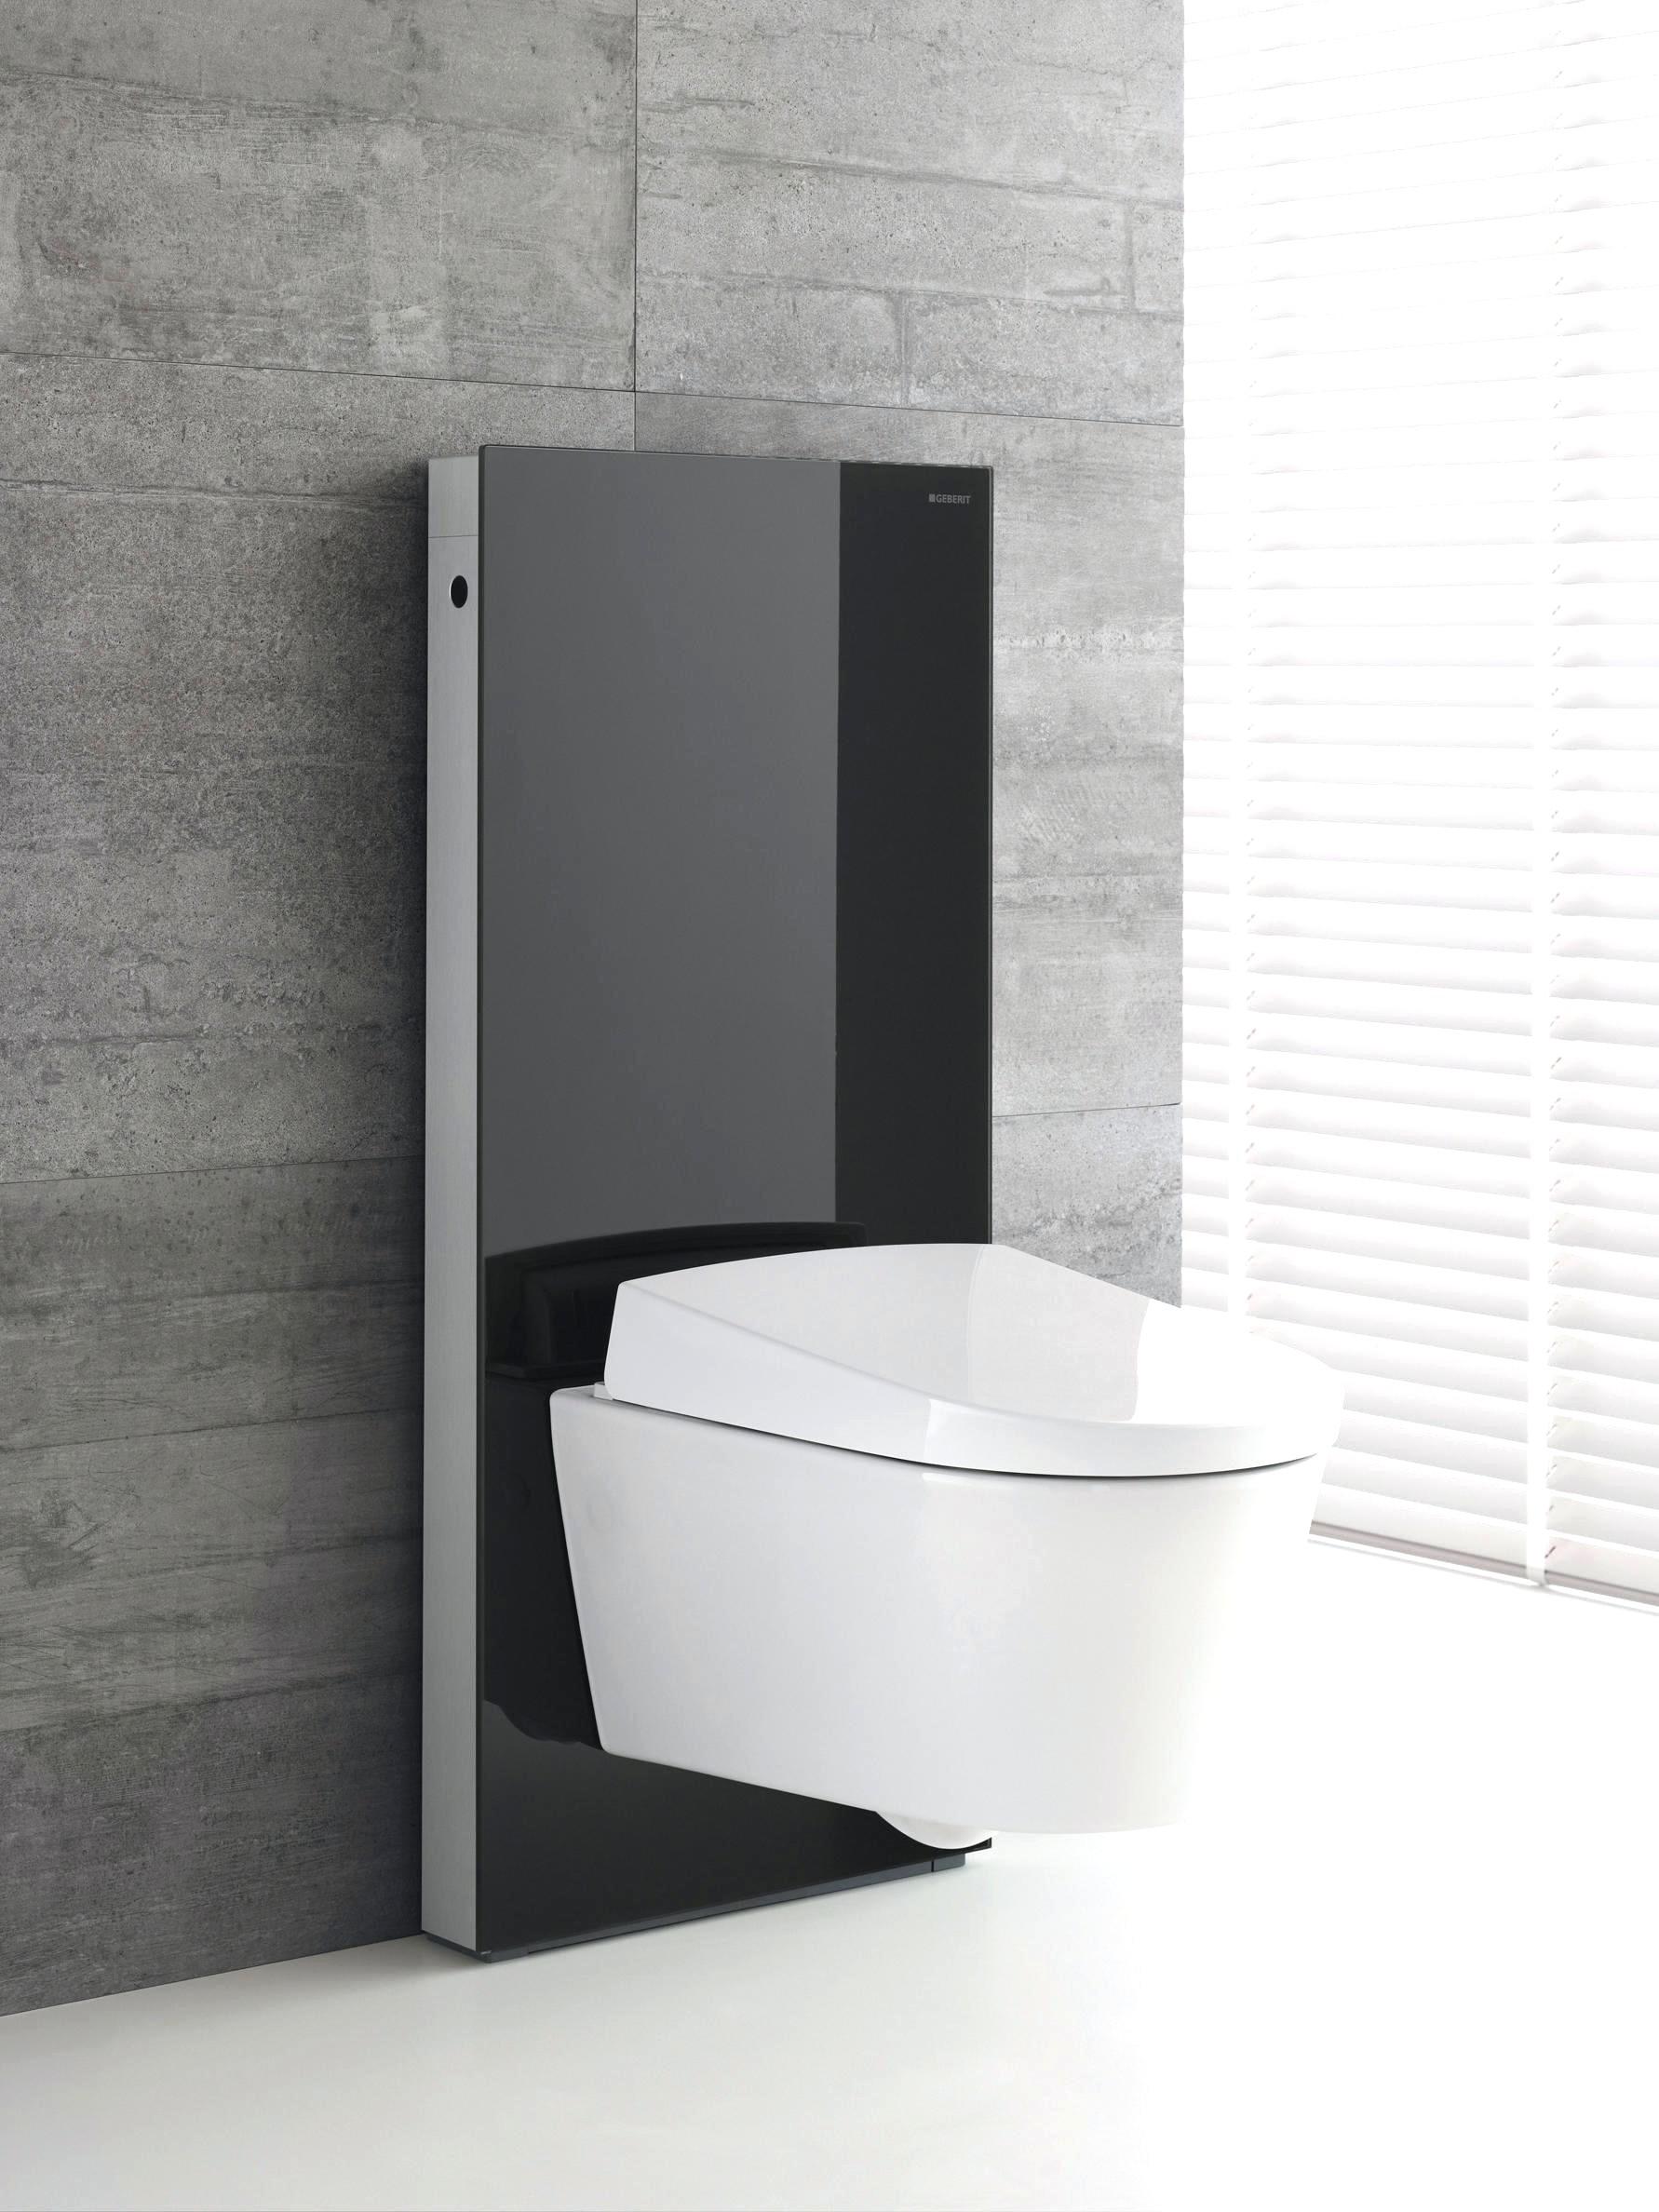 Pack Wc Suspendu Grohe Opus Cheap Pack Wc Suspendu Grohe concernant Toilette Suspendu Pas Cher